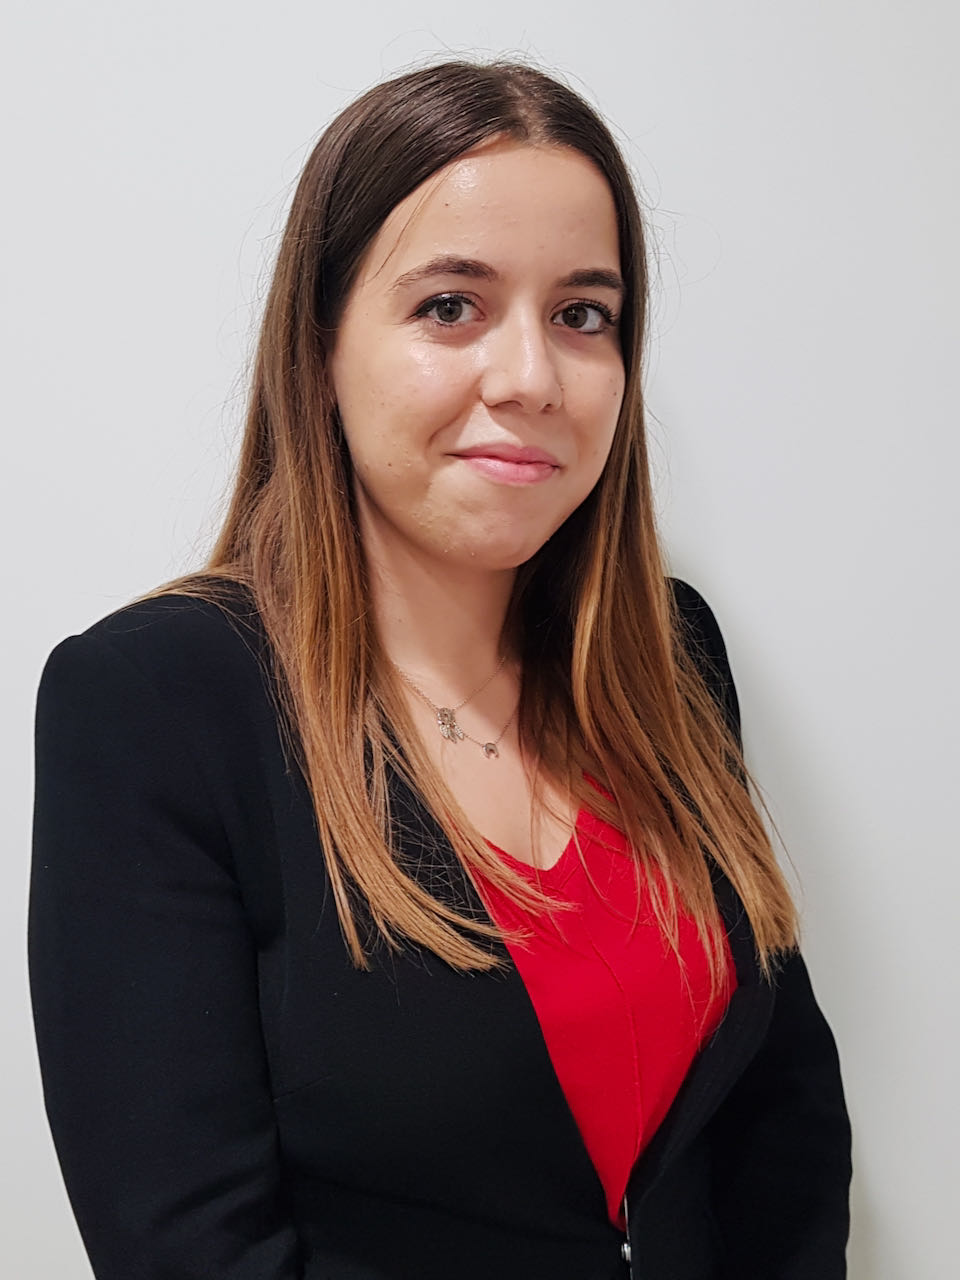 Sra. Núria Albert Masip